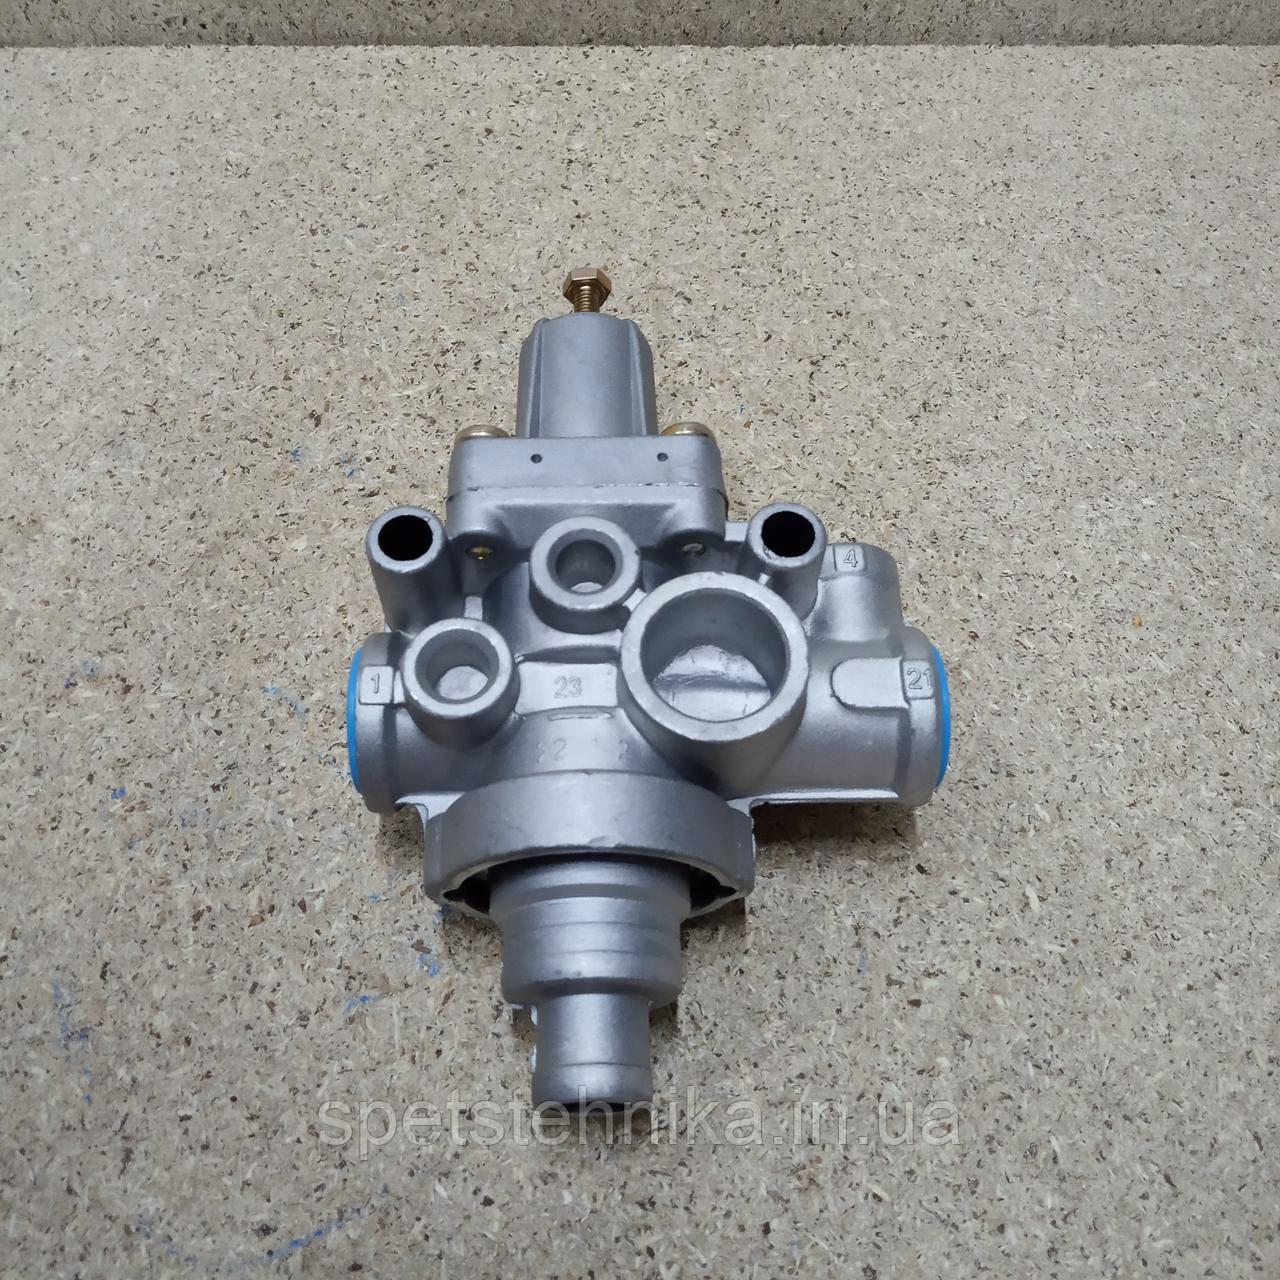 EQ153 Перепускной клапан LG853.08.08